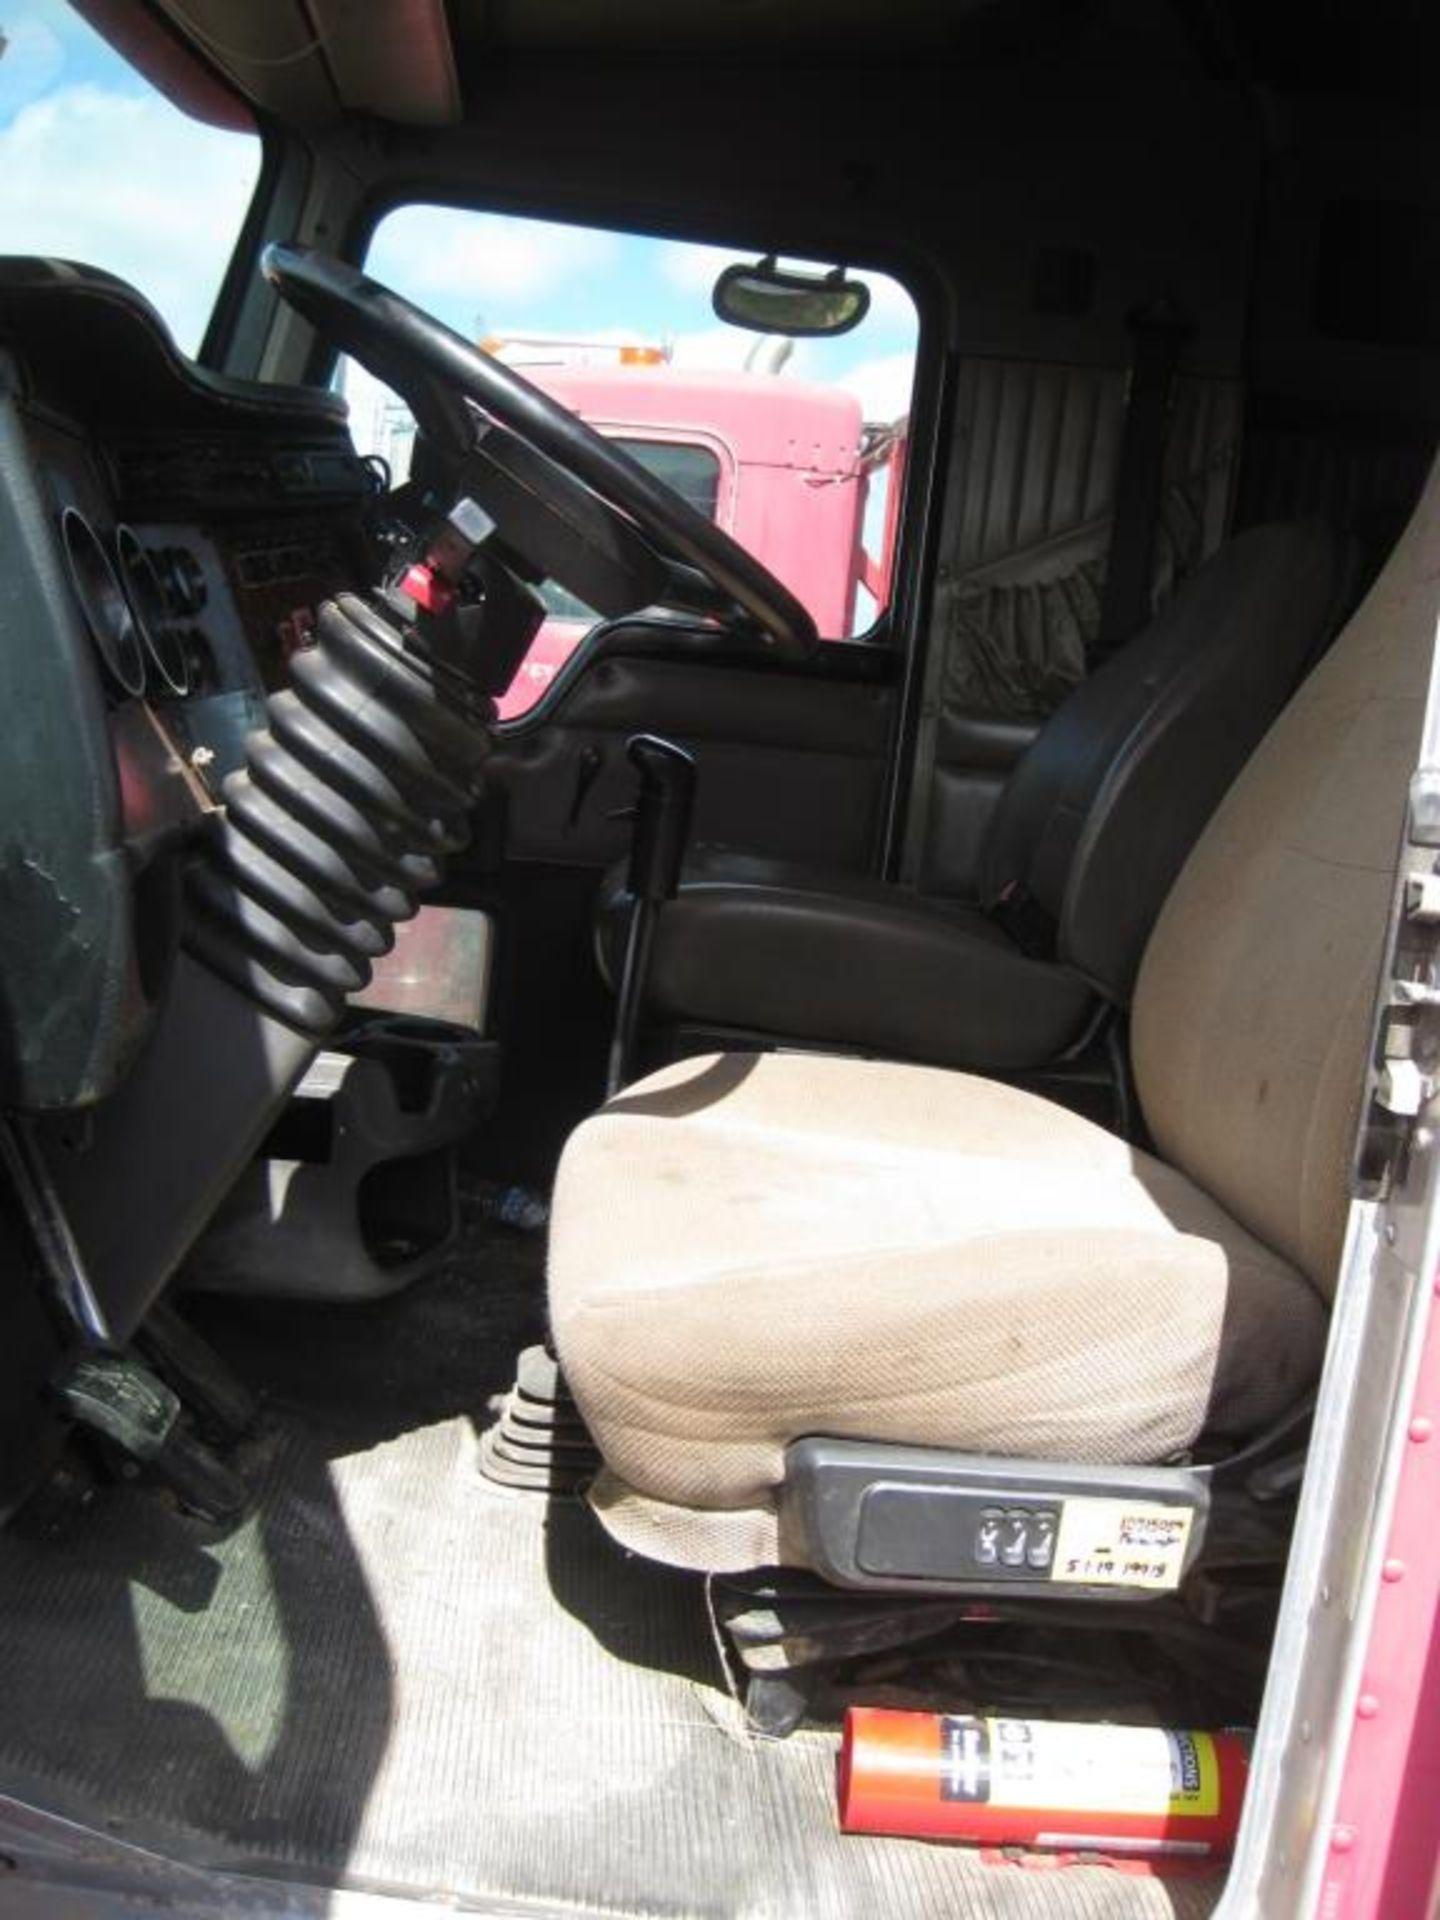 Kenworth Truck - Image 10 of 20